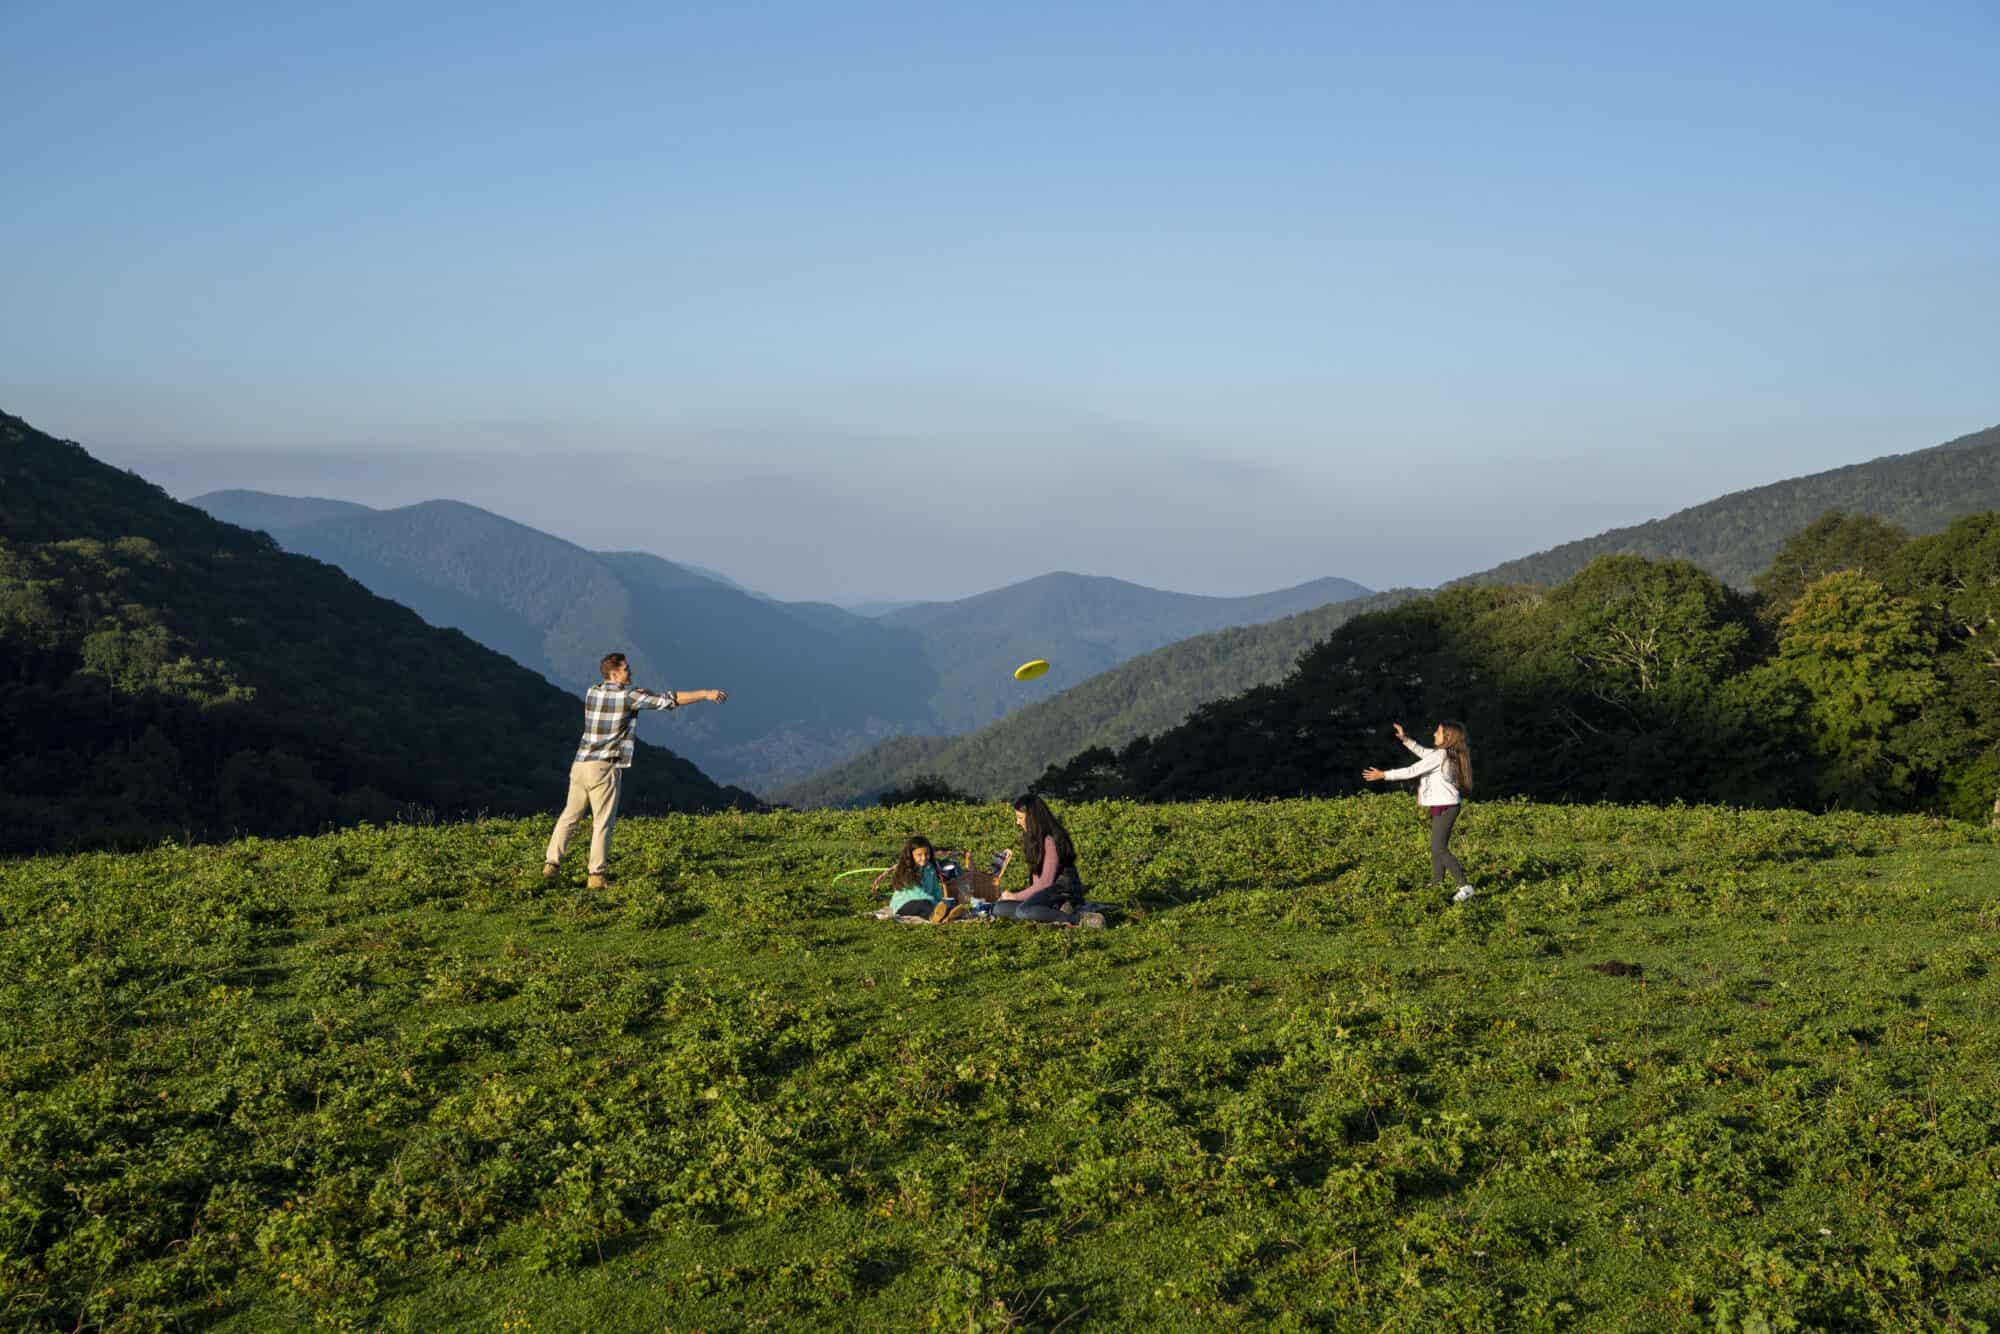 A young family having a picnic atop Cataloochee Meadow.